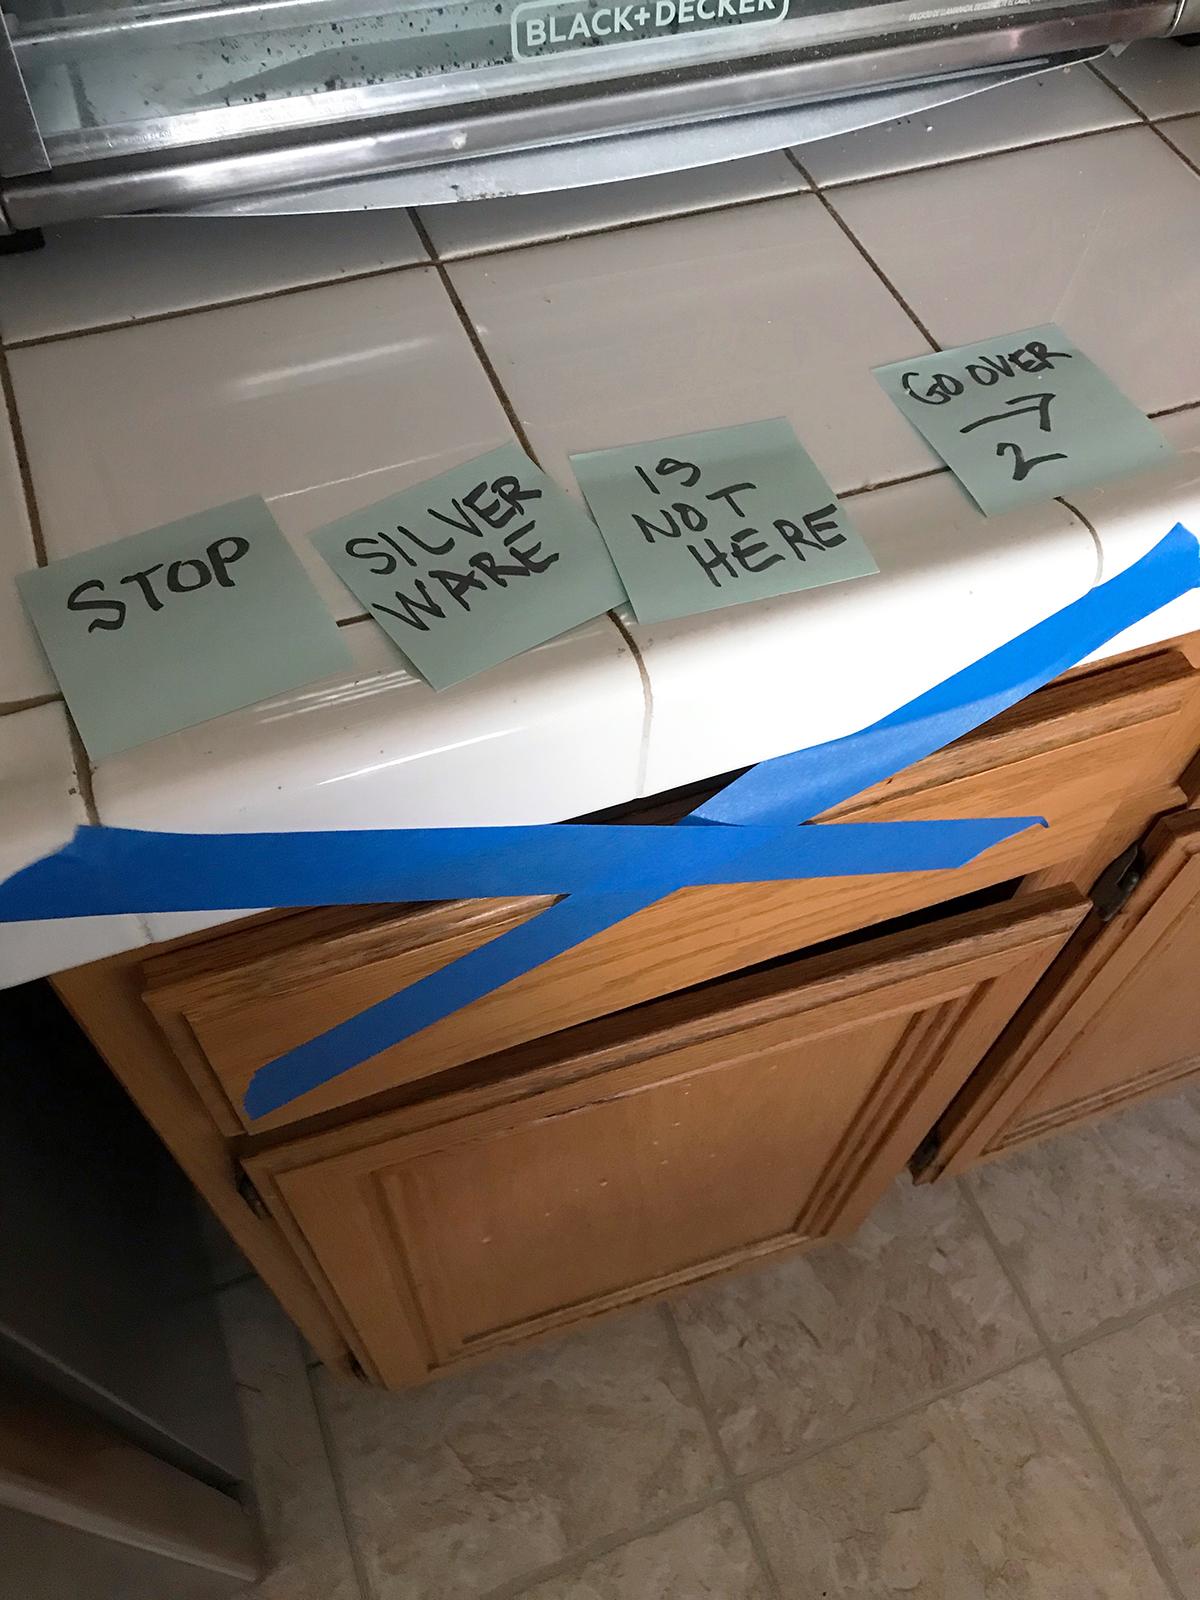 silverware drawer with warning